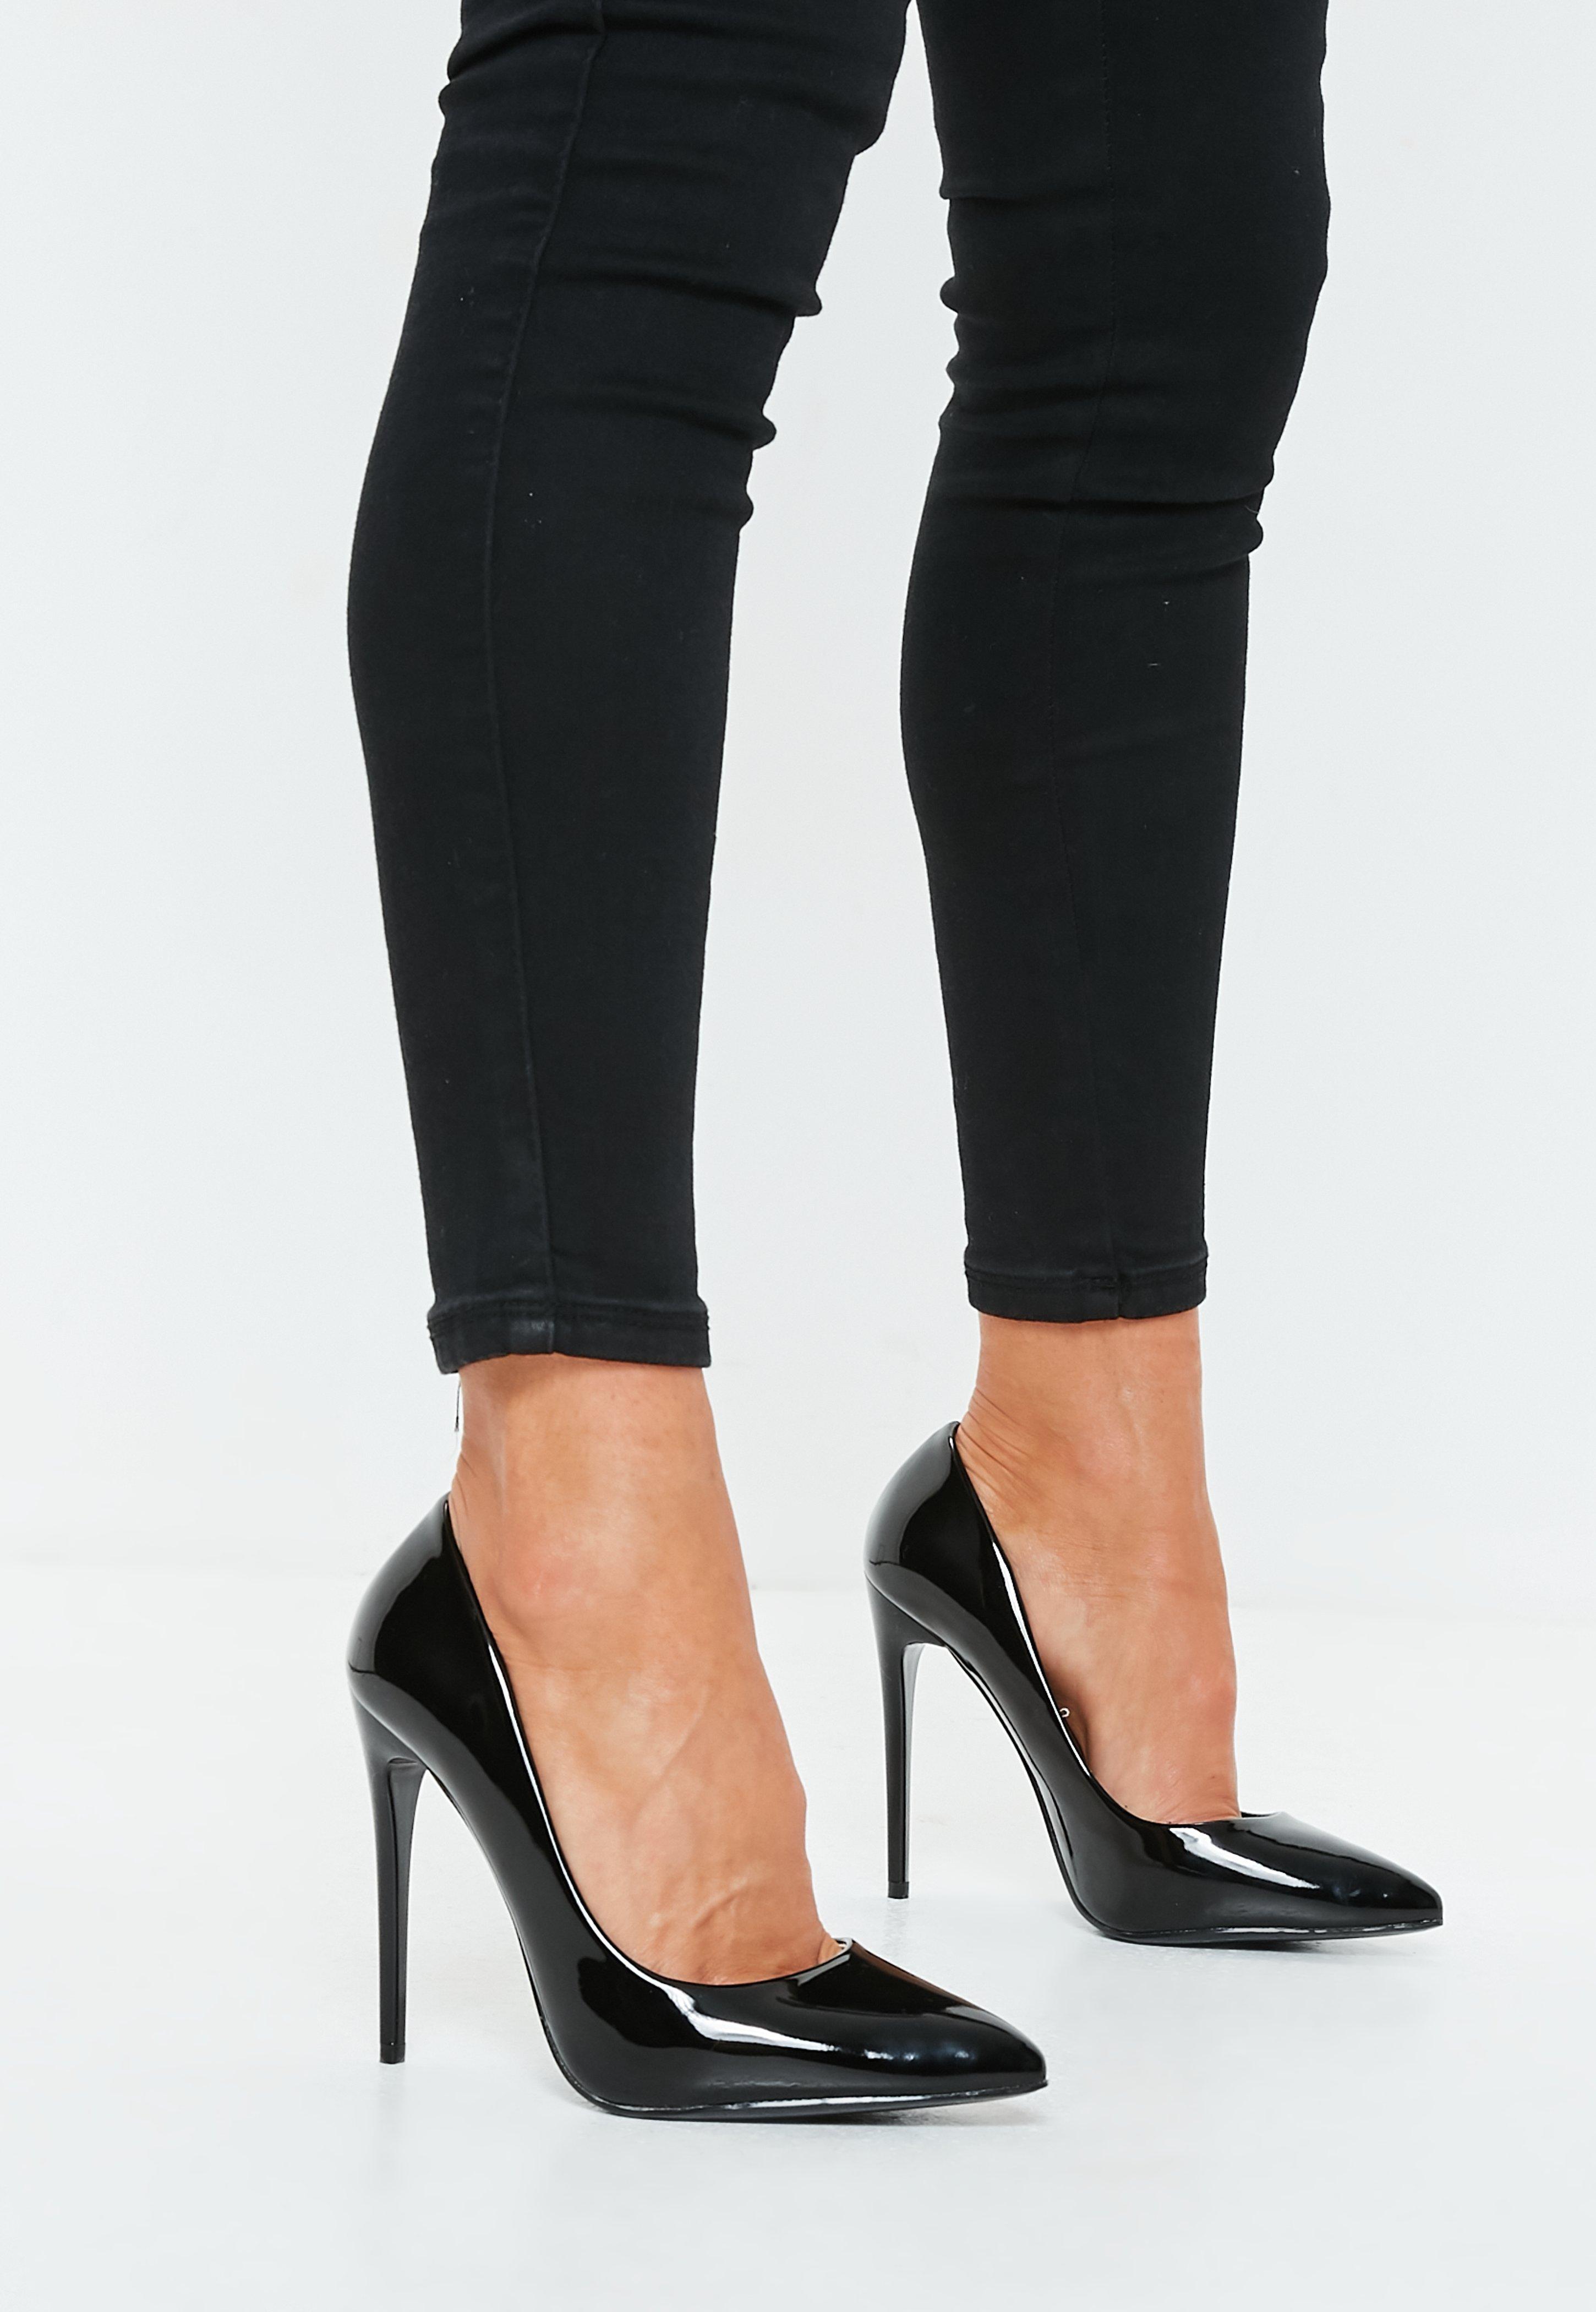 a2e6b6b645c Black PU Pointed Toe Court Heels